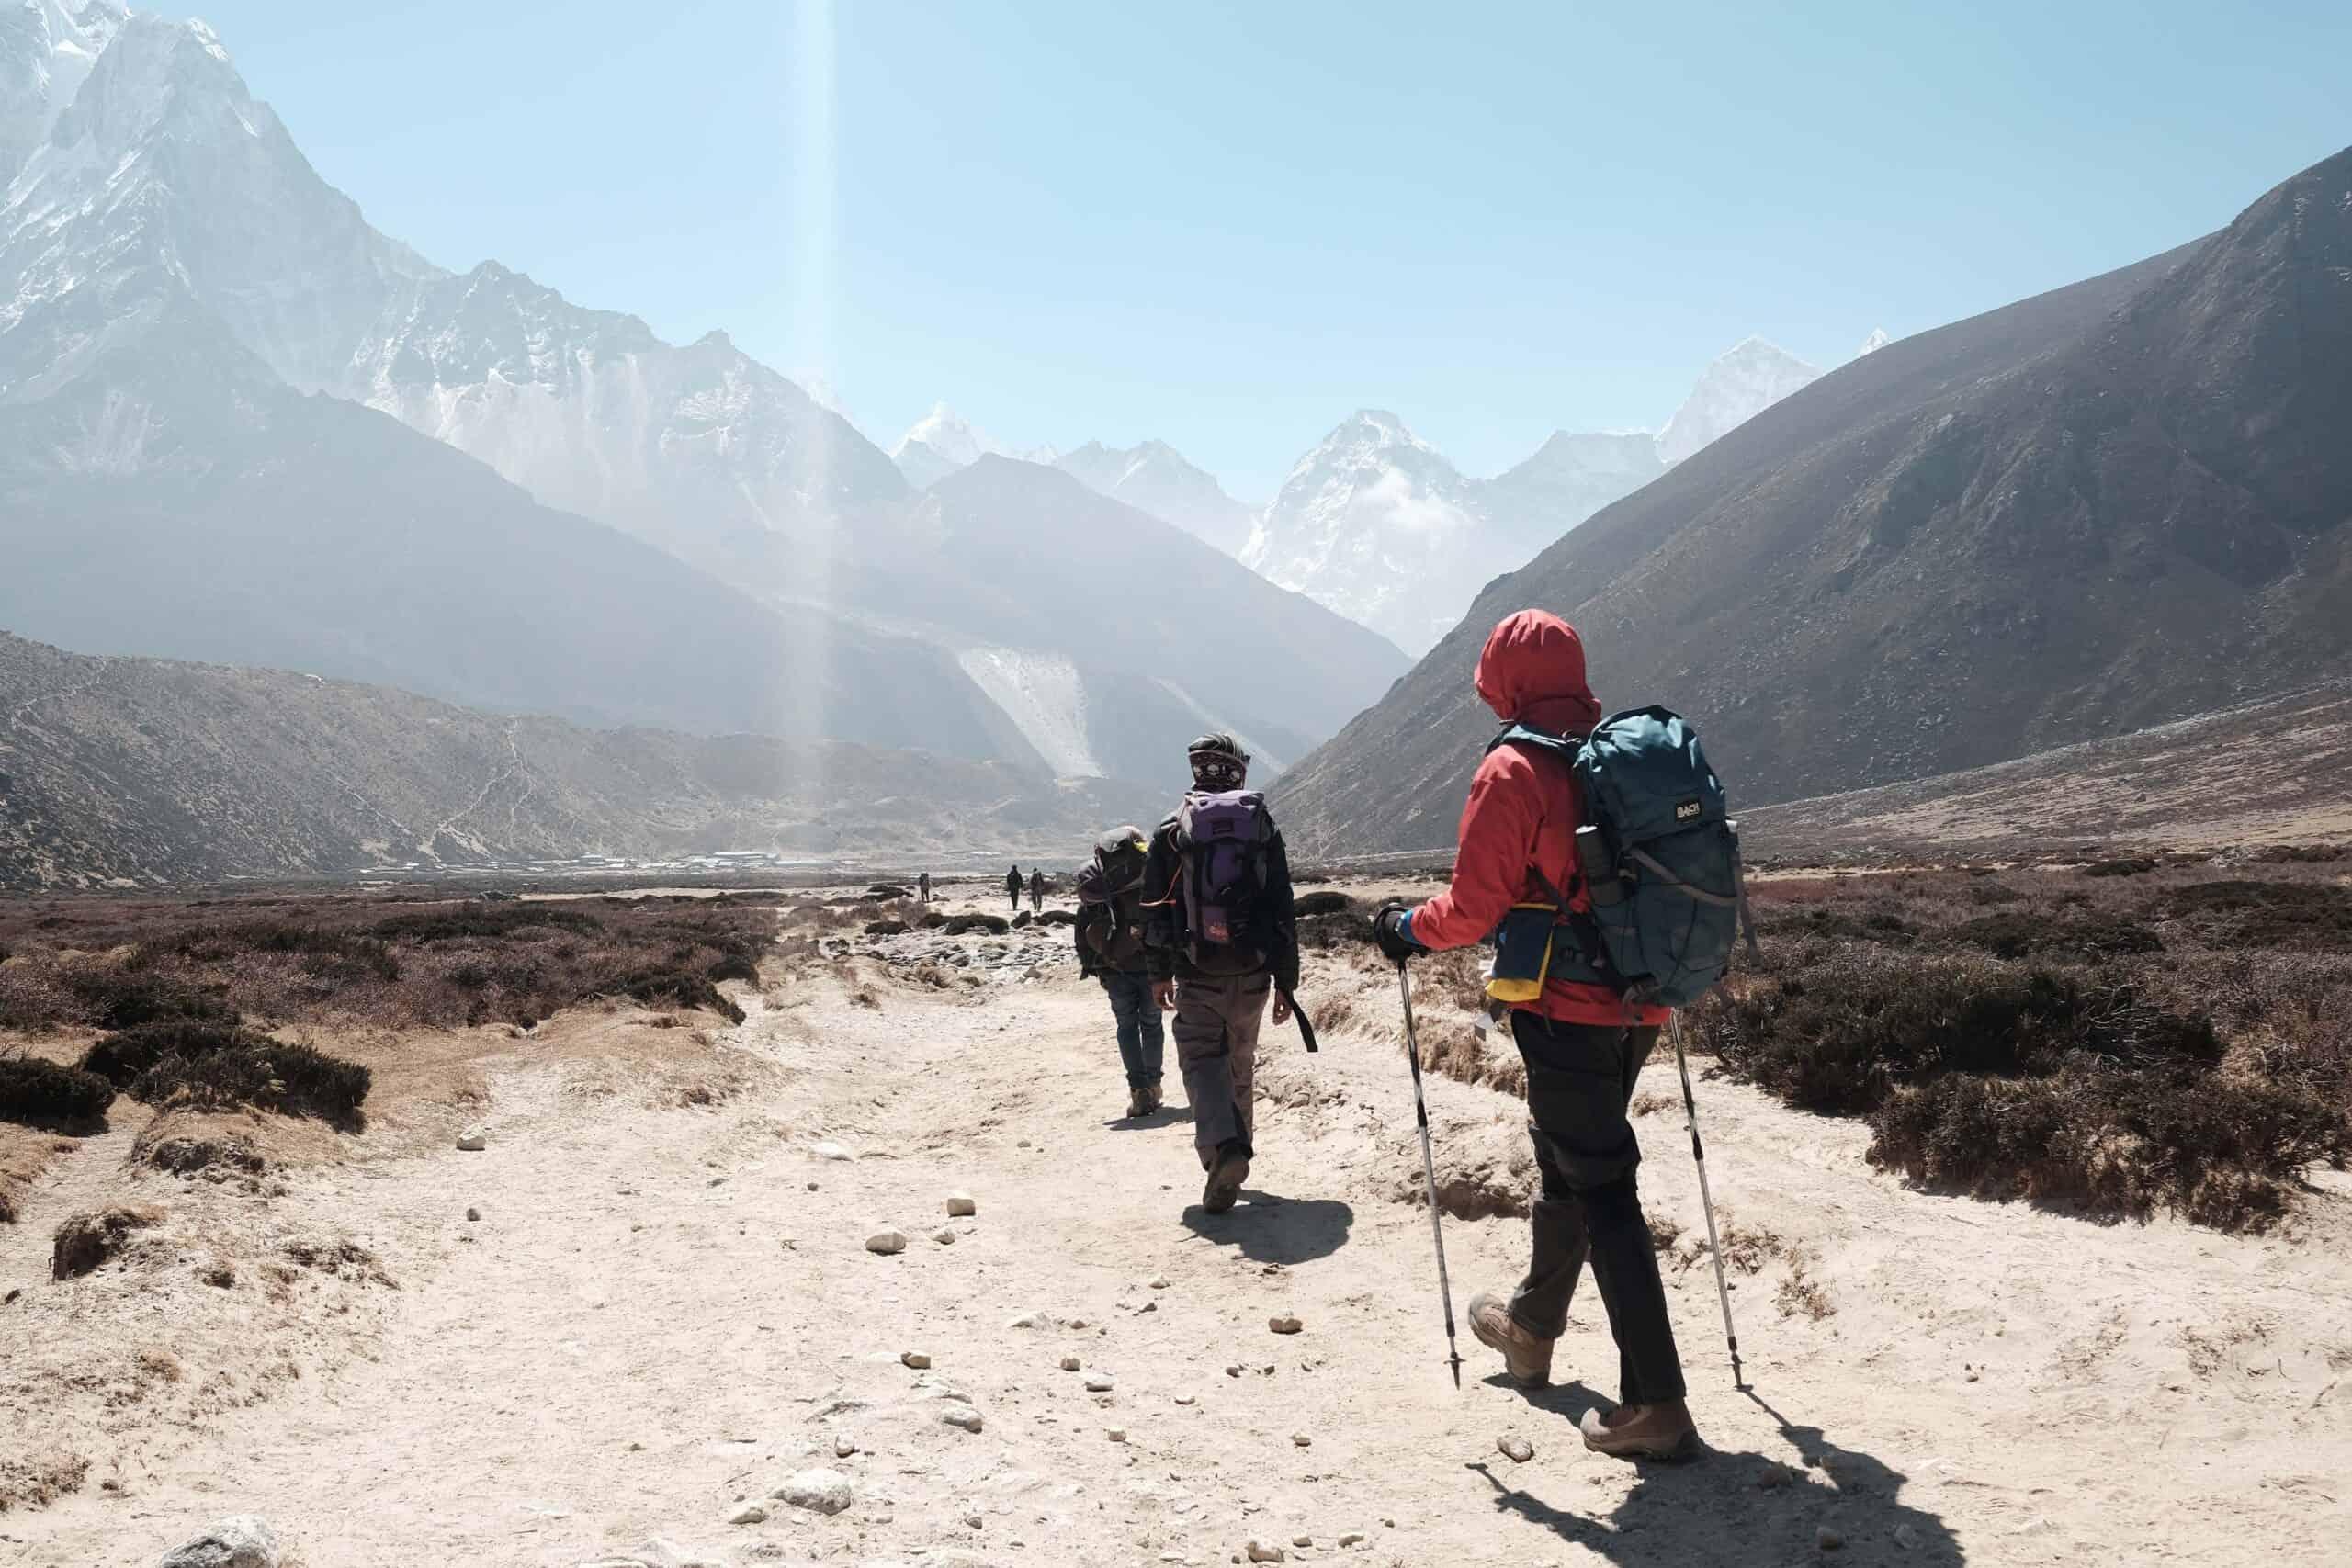 ultralight hiking backpacking